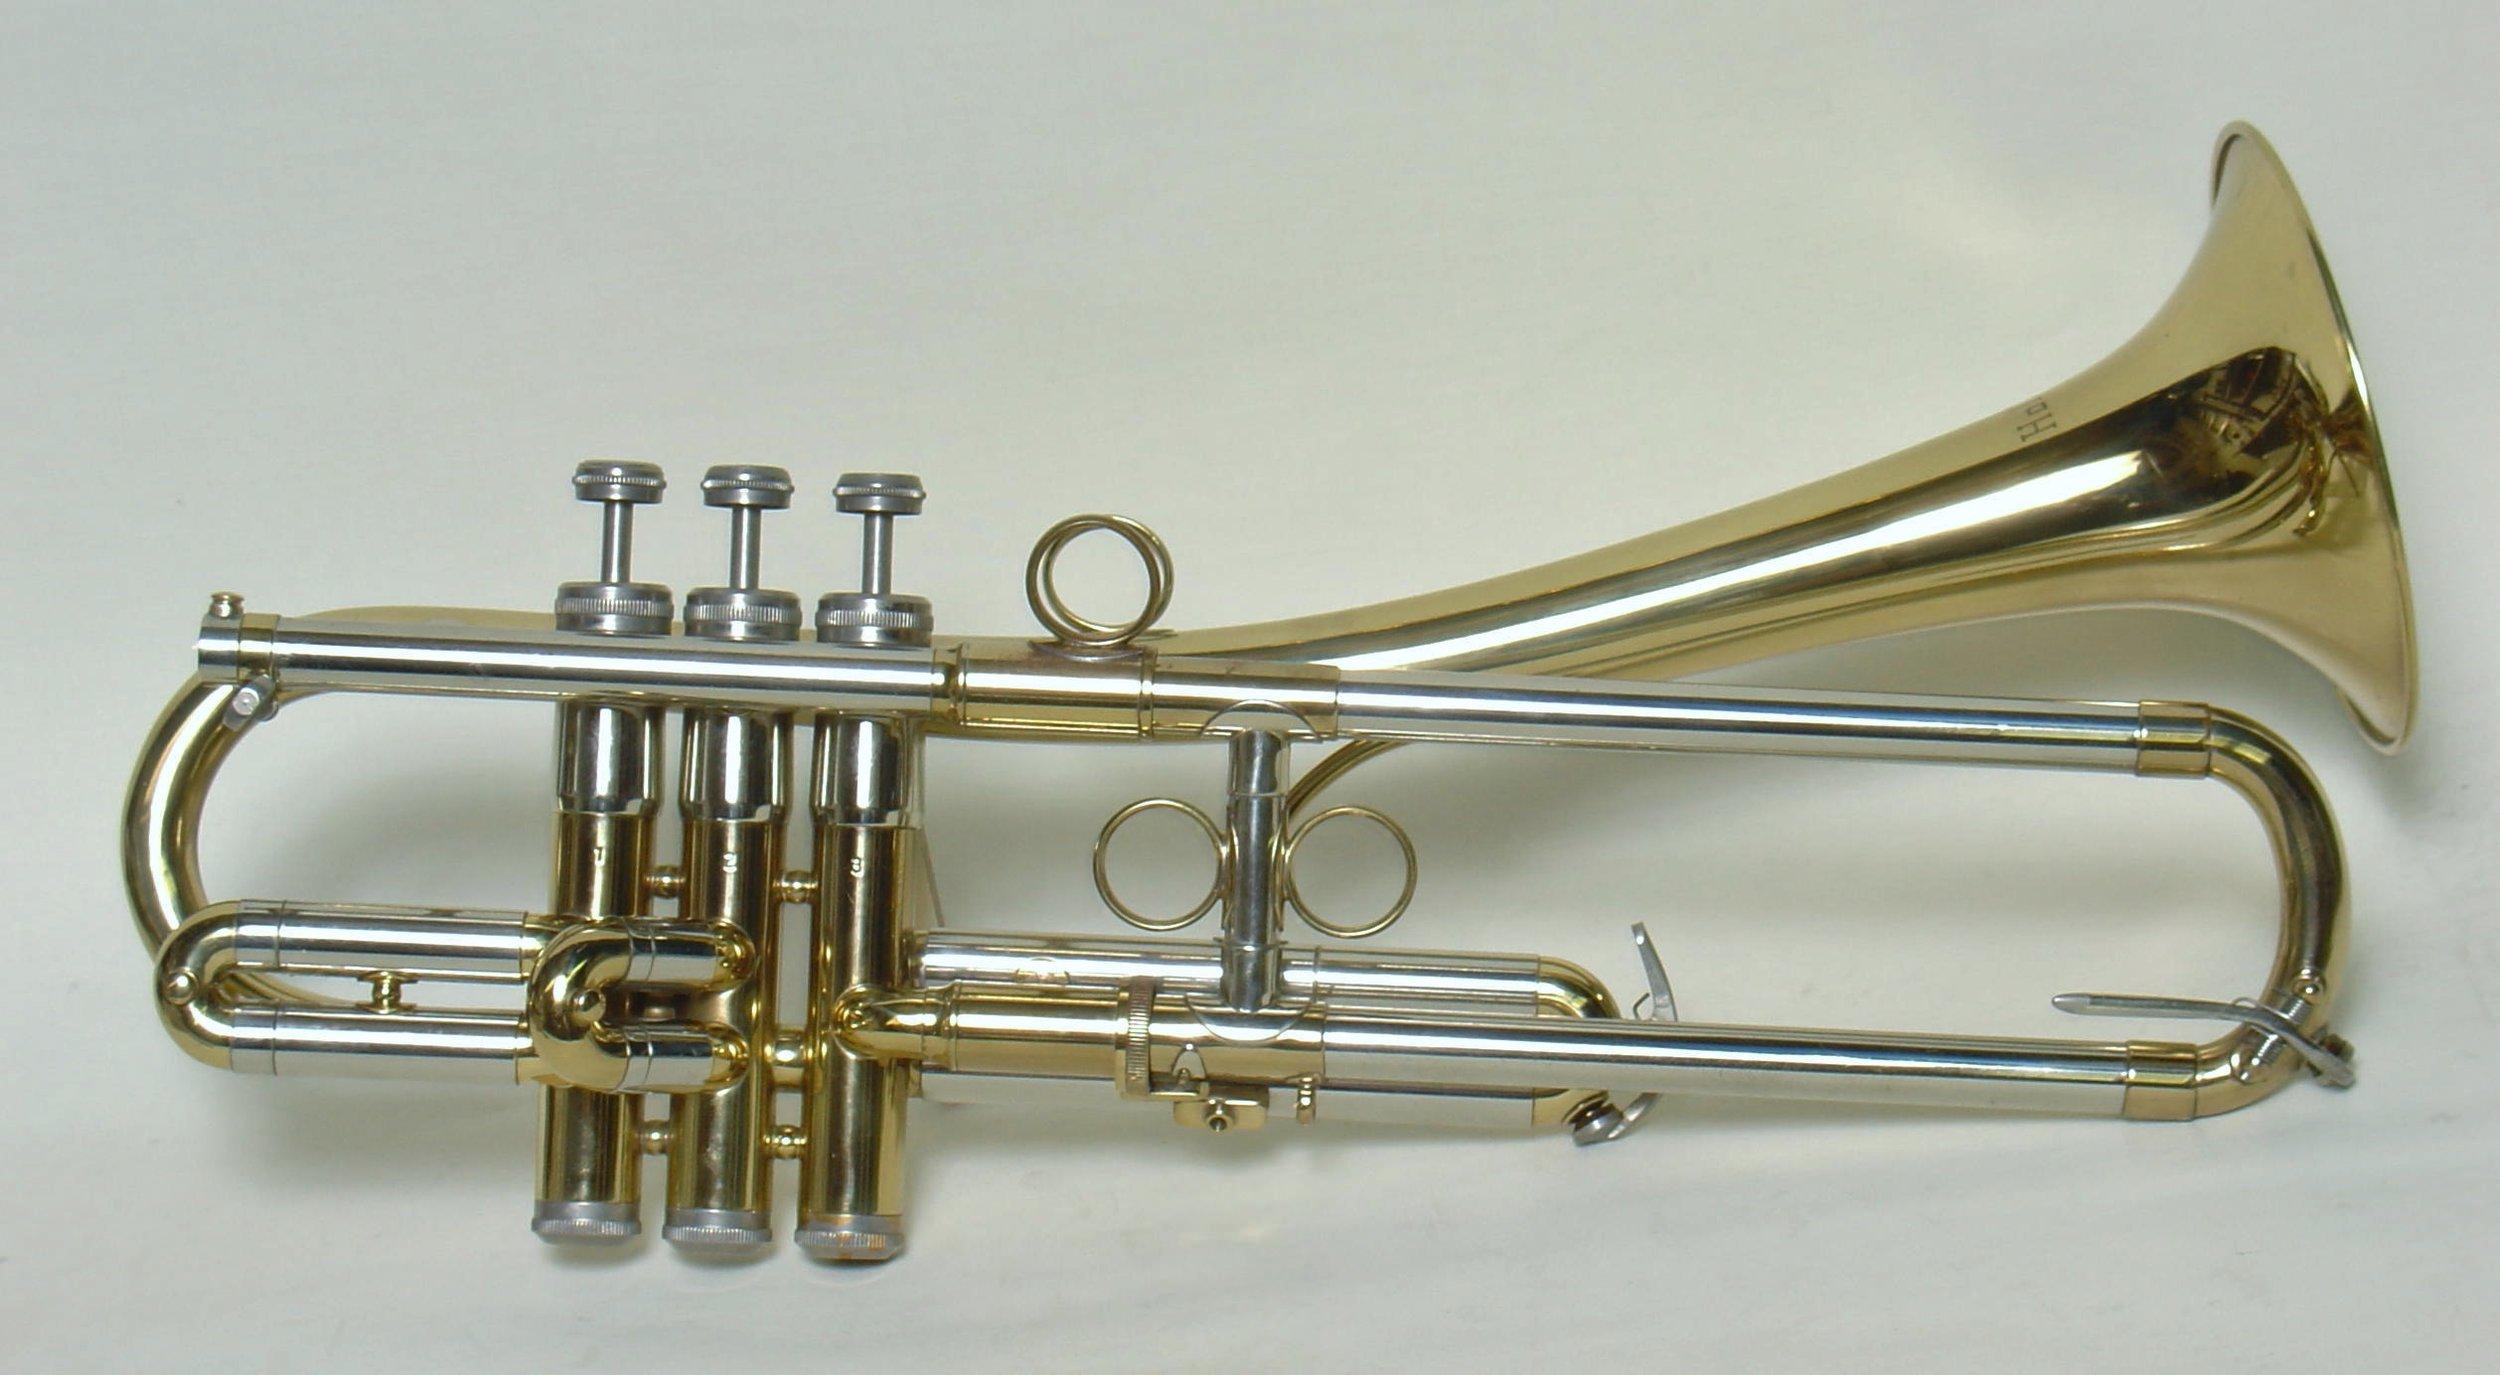 A Trumpet Called Jumbo